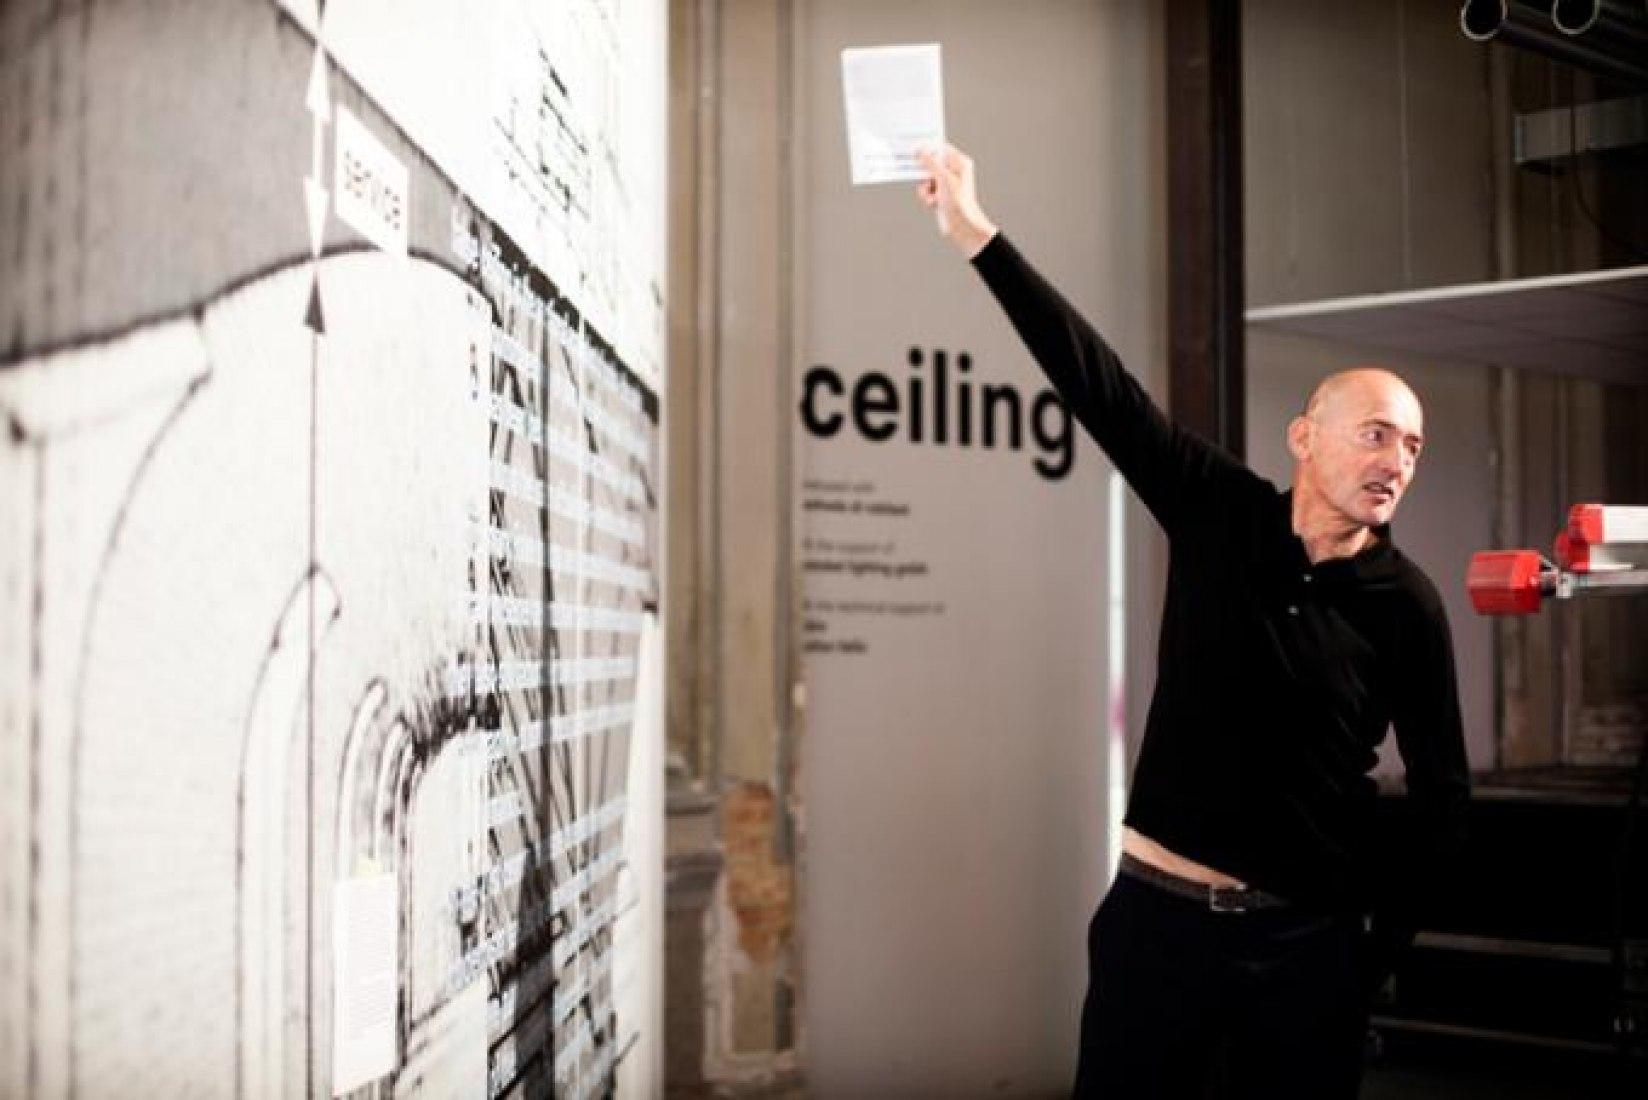 Rem Koolhaas. Venice Biennale 2014. Photography © Italo Rondinella. Courtesy of la Biennale di Venezia.